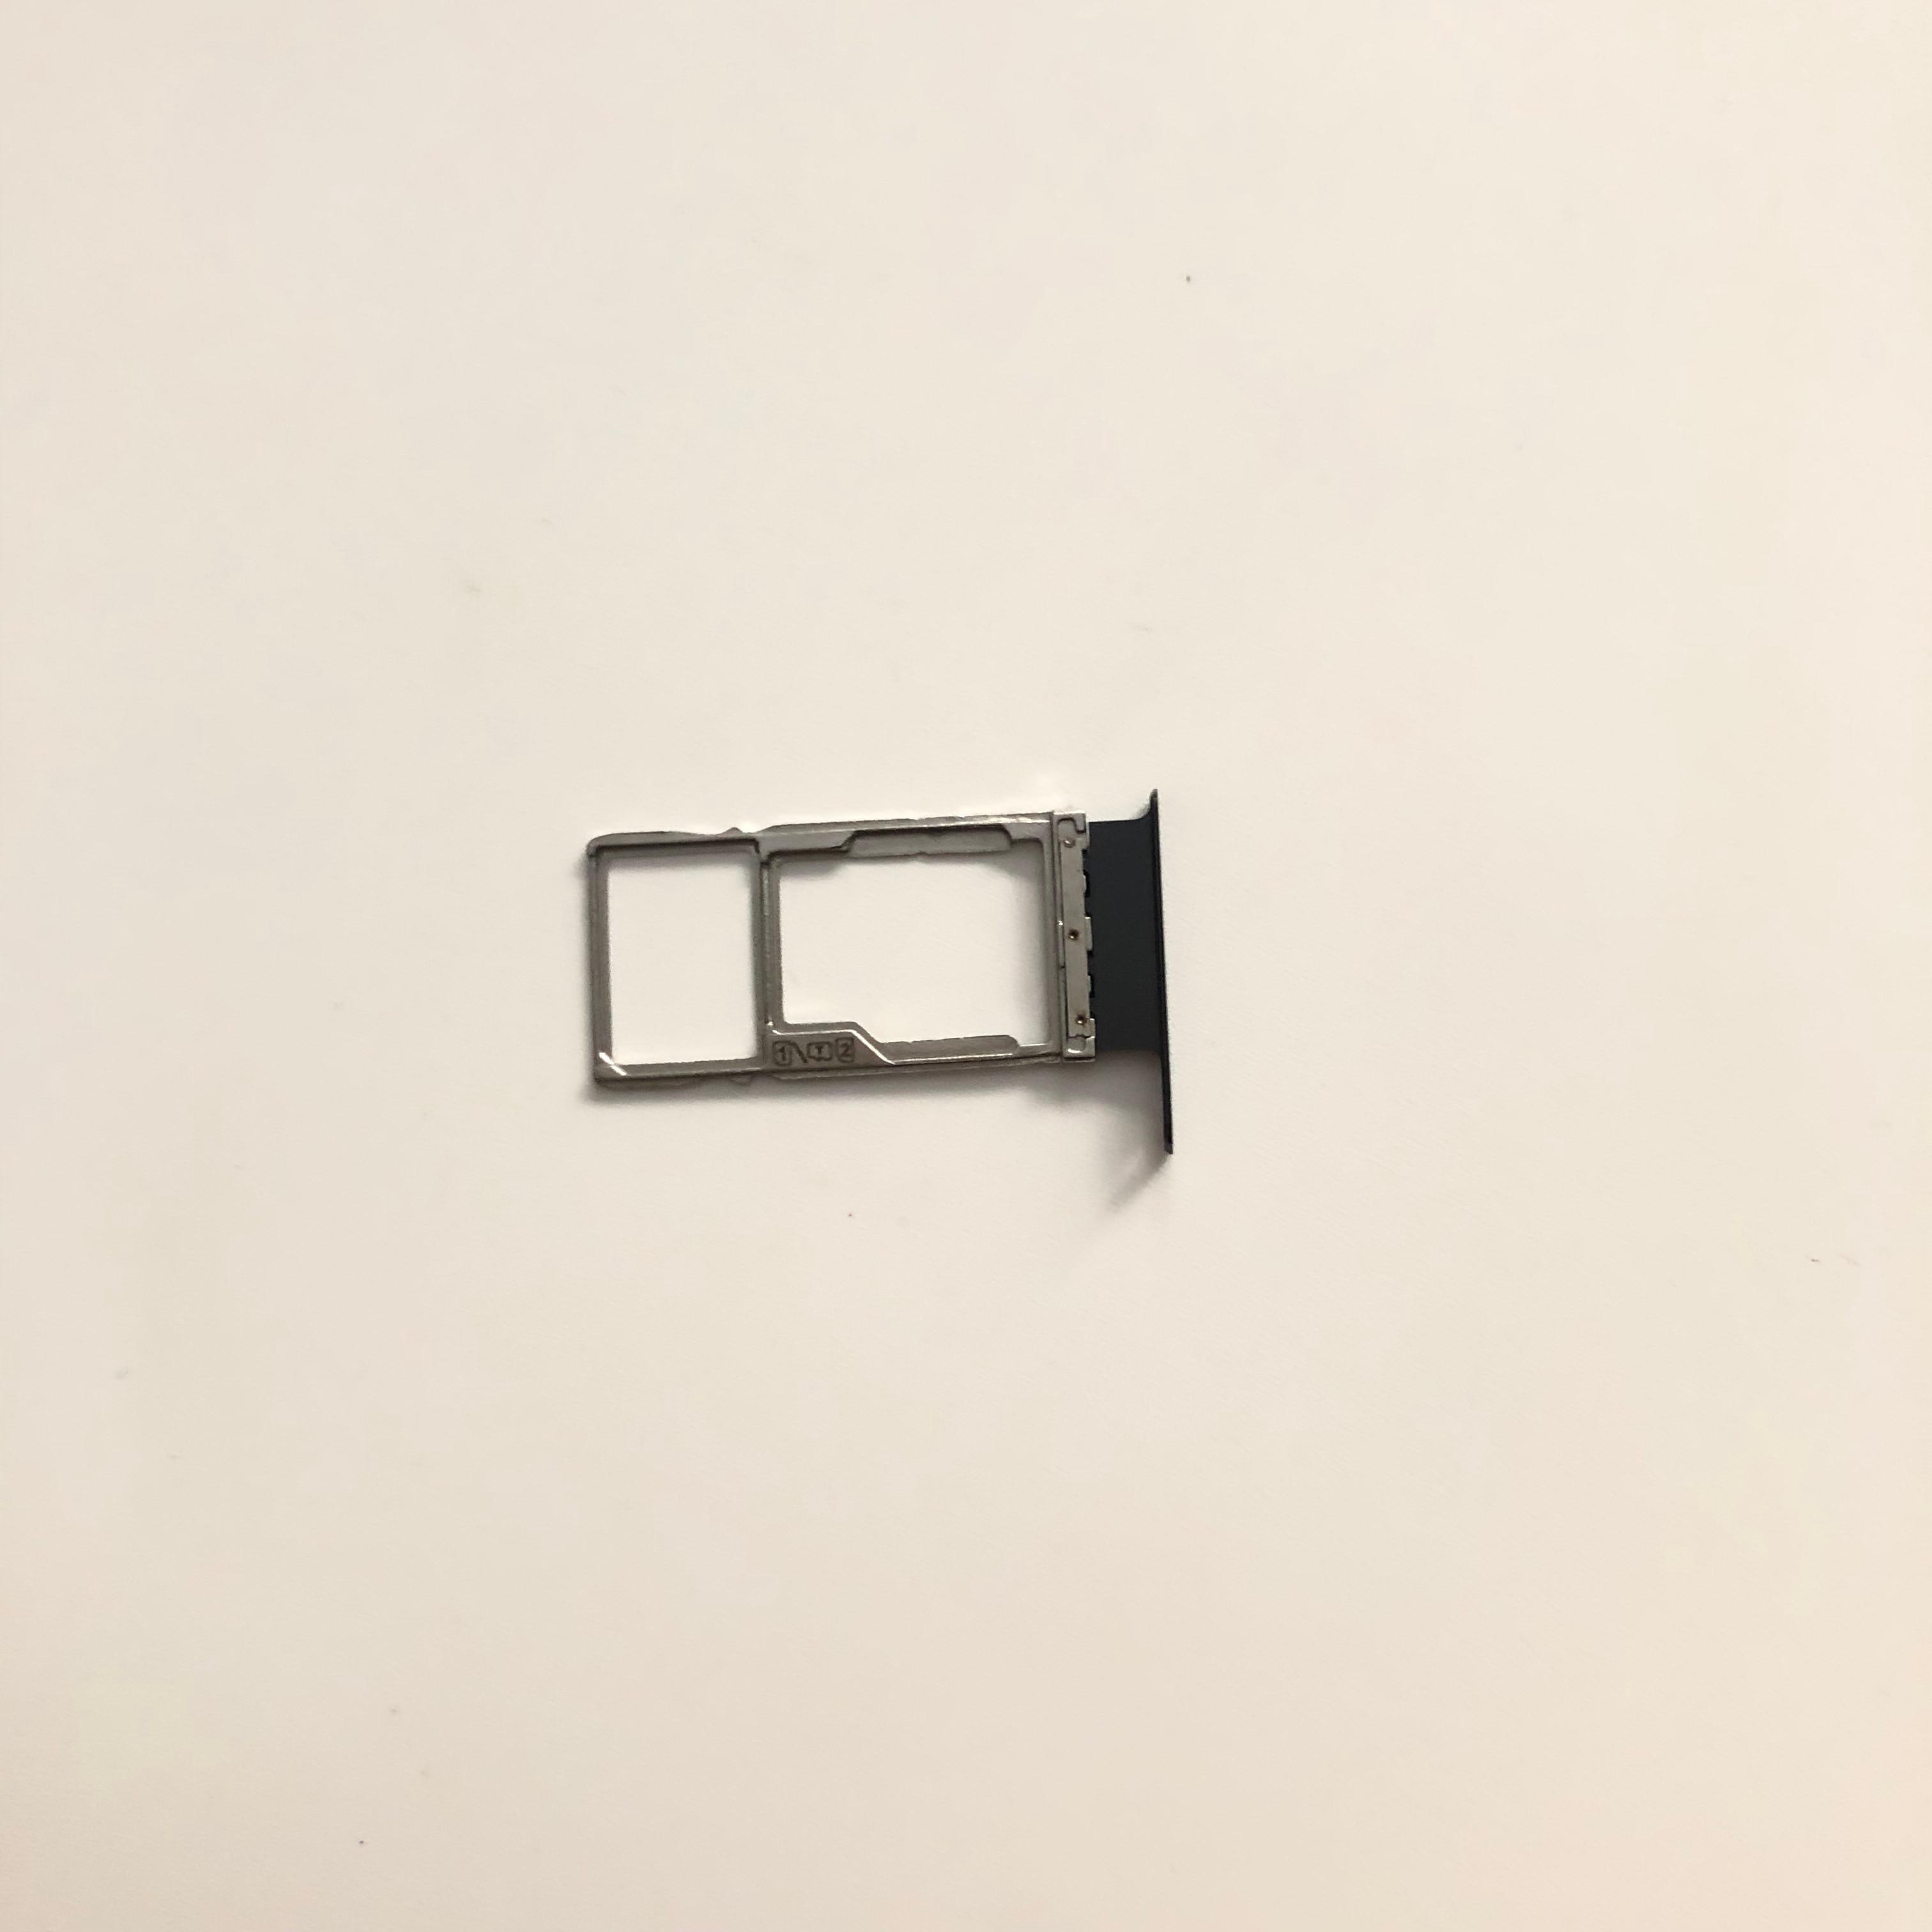 Фото - New Sim Card Holder Tray Card Slot For Ulefone Power 5 MTK6763 Octa Core 6.0 FHD 2160x1080 Free Shipping new sim card holder tray card slot replacement for oukitel k6000 plus mtk6750t octa core 5 5 fhd 1920x1080